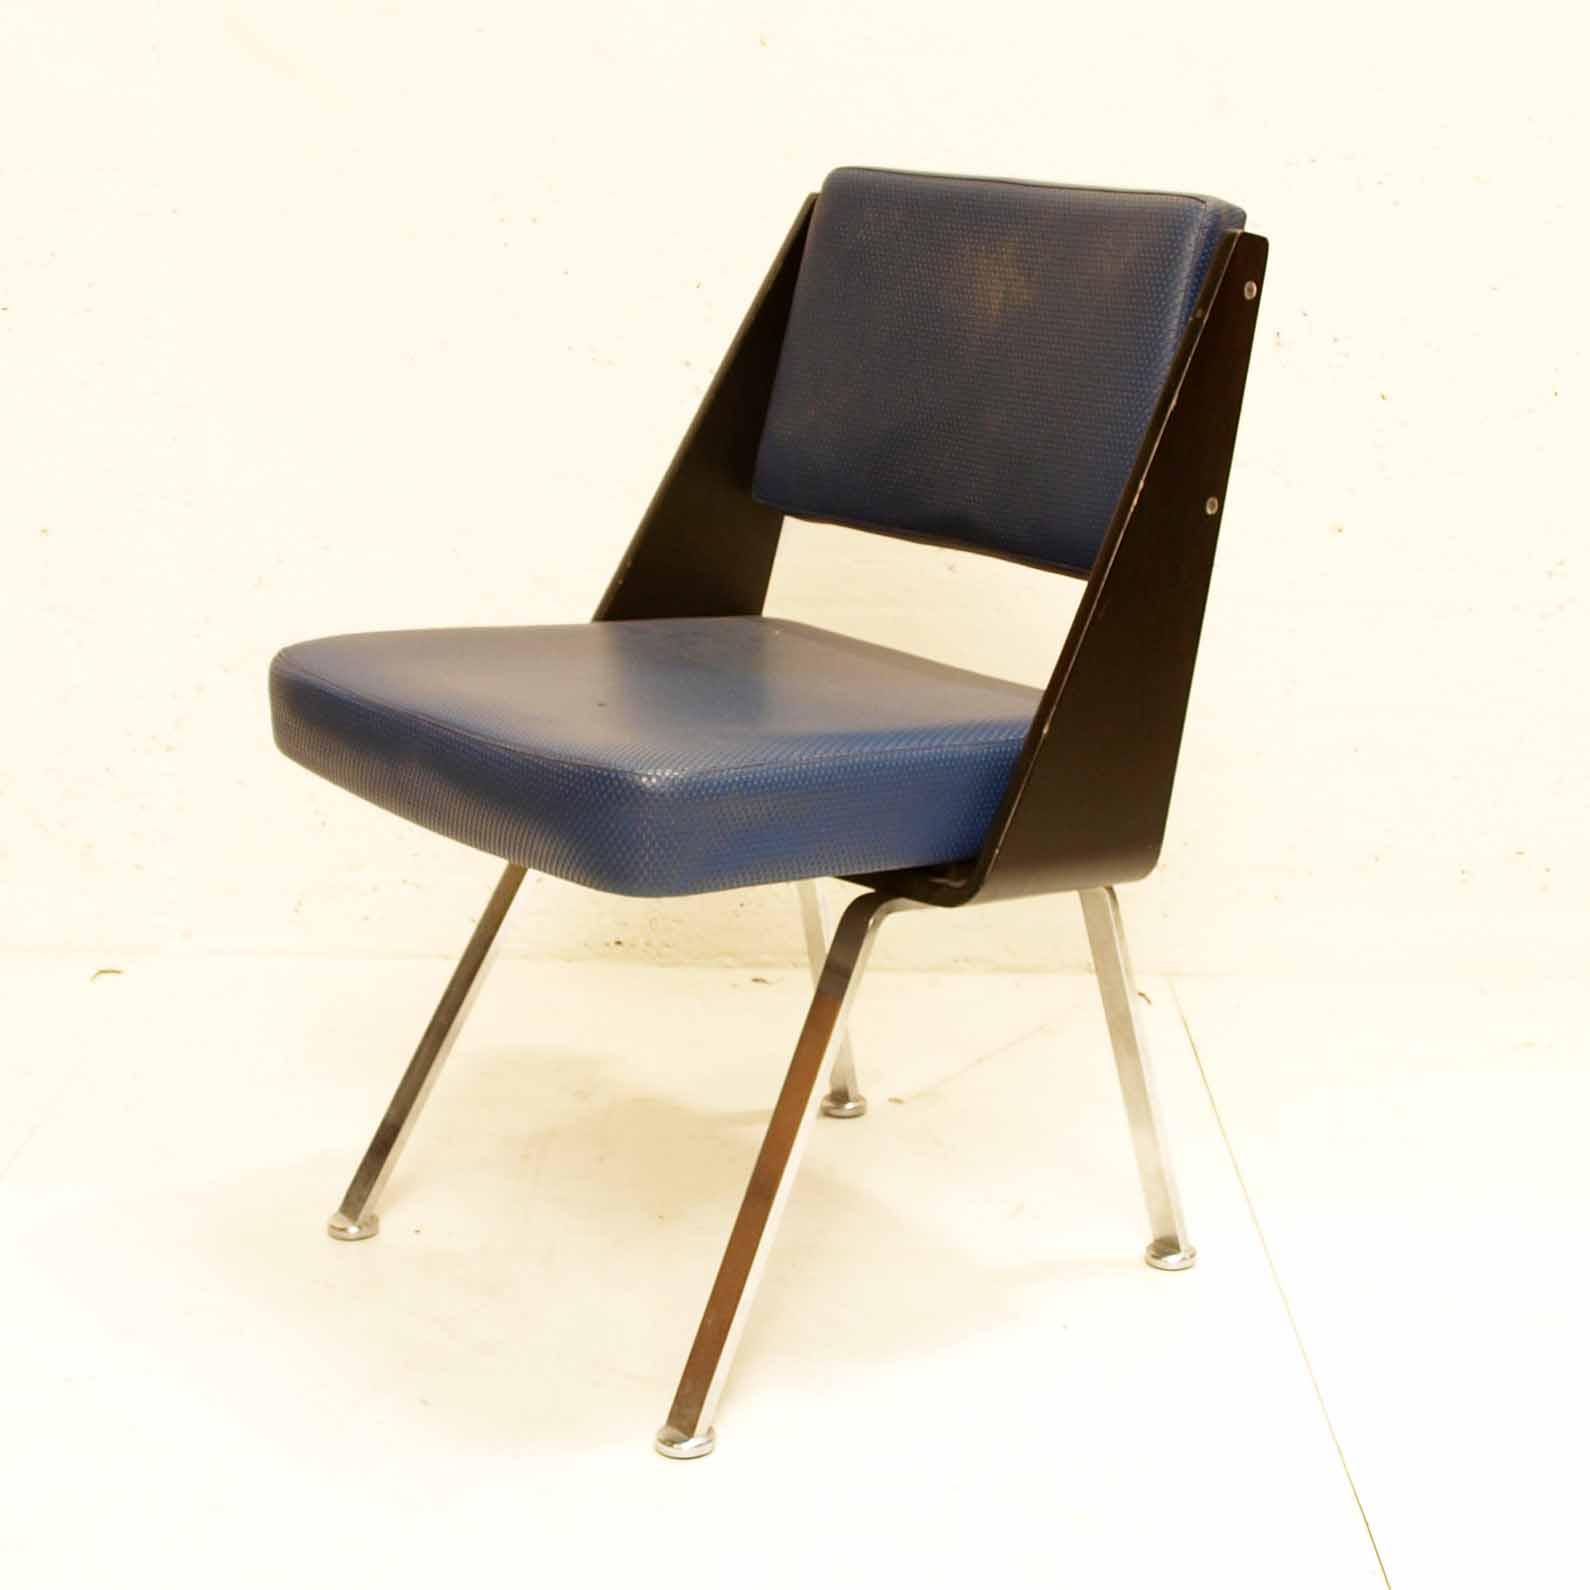 Brno Stuhl brno stuhl ludwig mies der rohe möbel zürich vintagemöbel